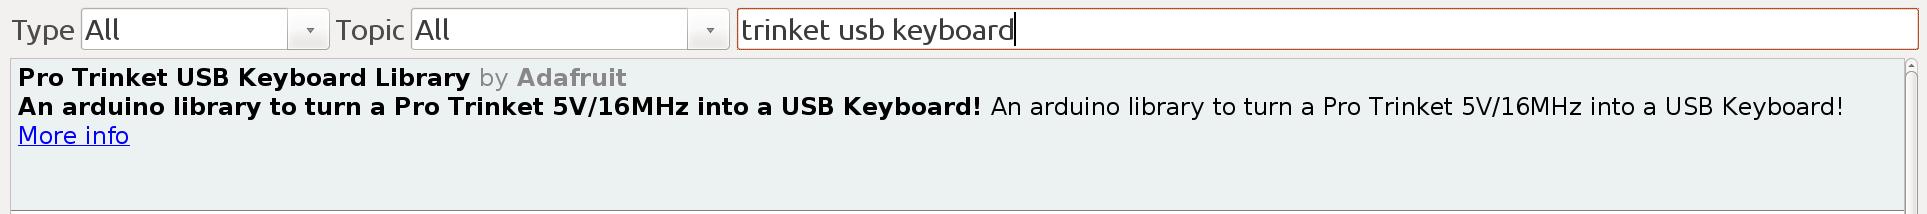 trinket_keyboard.png